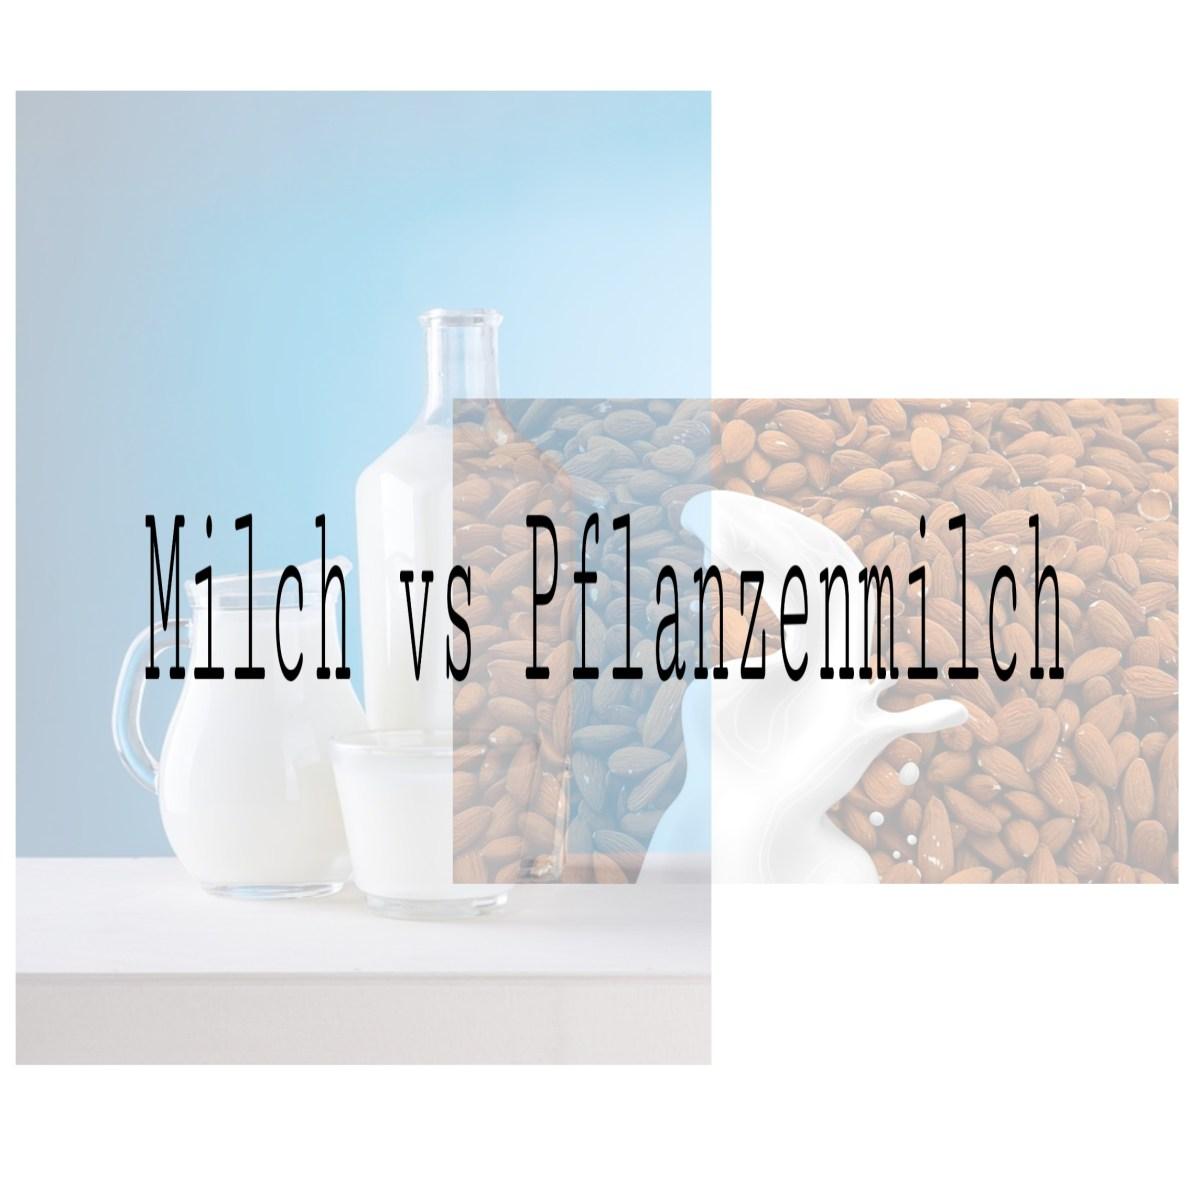 Kuhmilch vs Pflanzenmilch